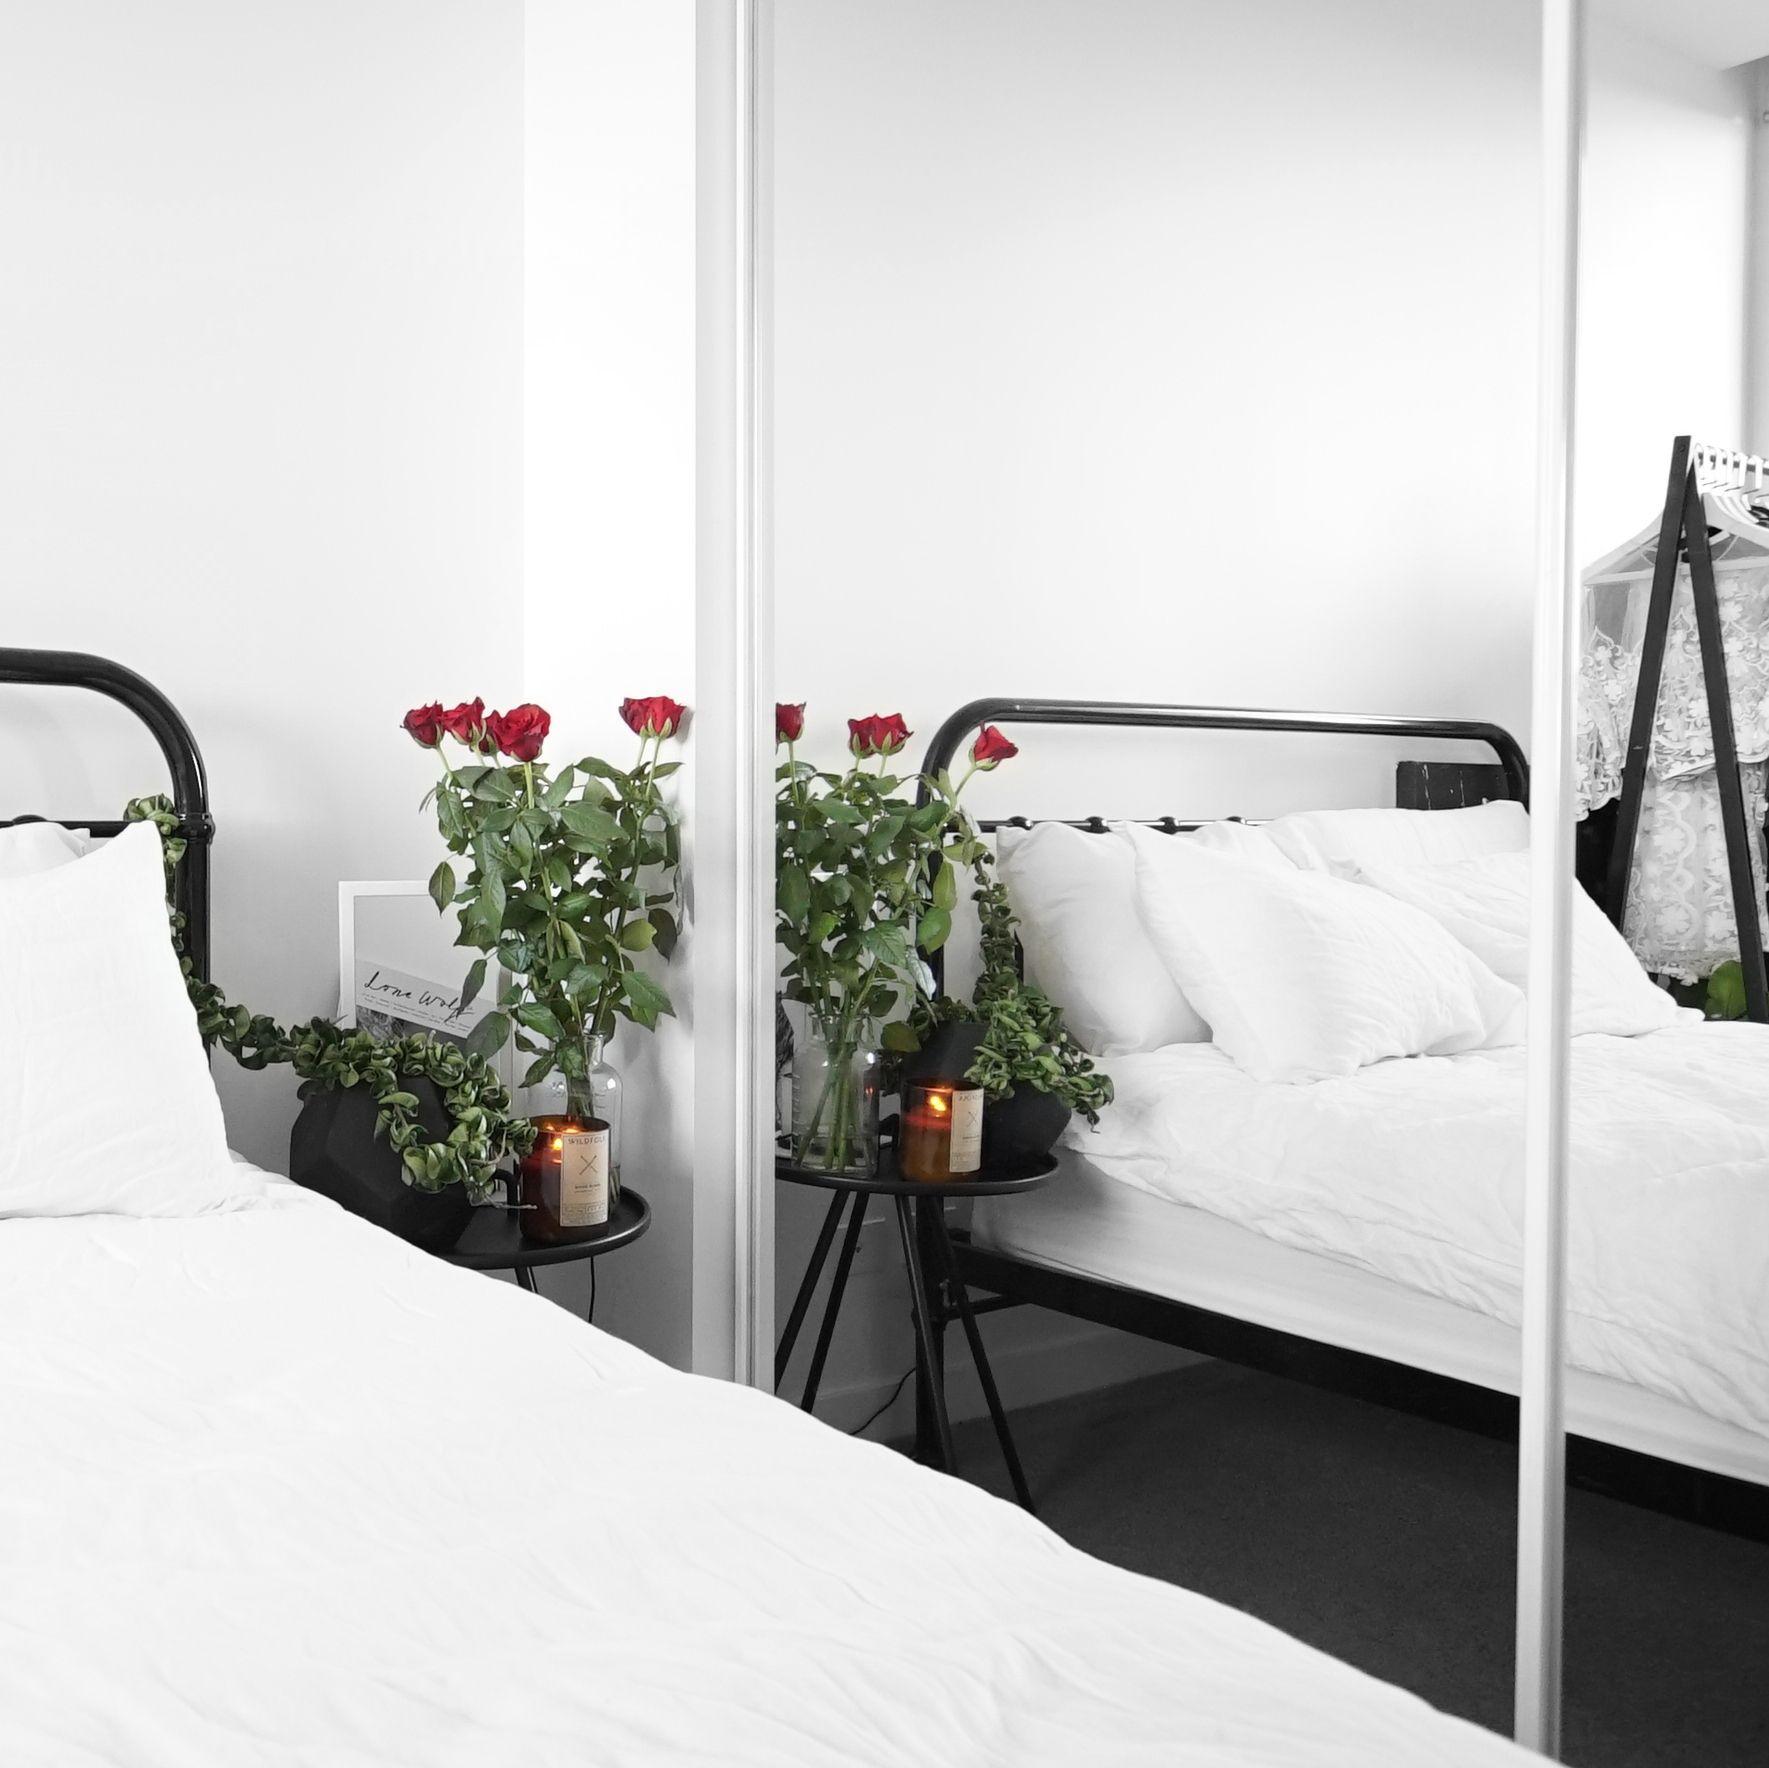 Ig Rachelaust Bedroom Interior Bedroom Inspirations Decorating My First Apartment